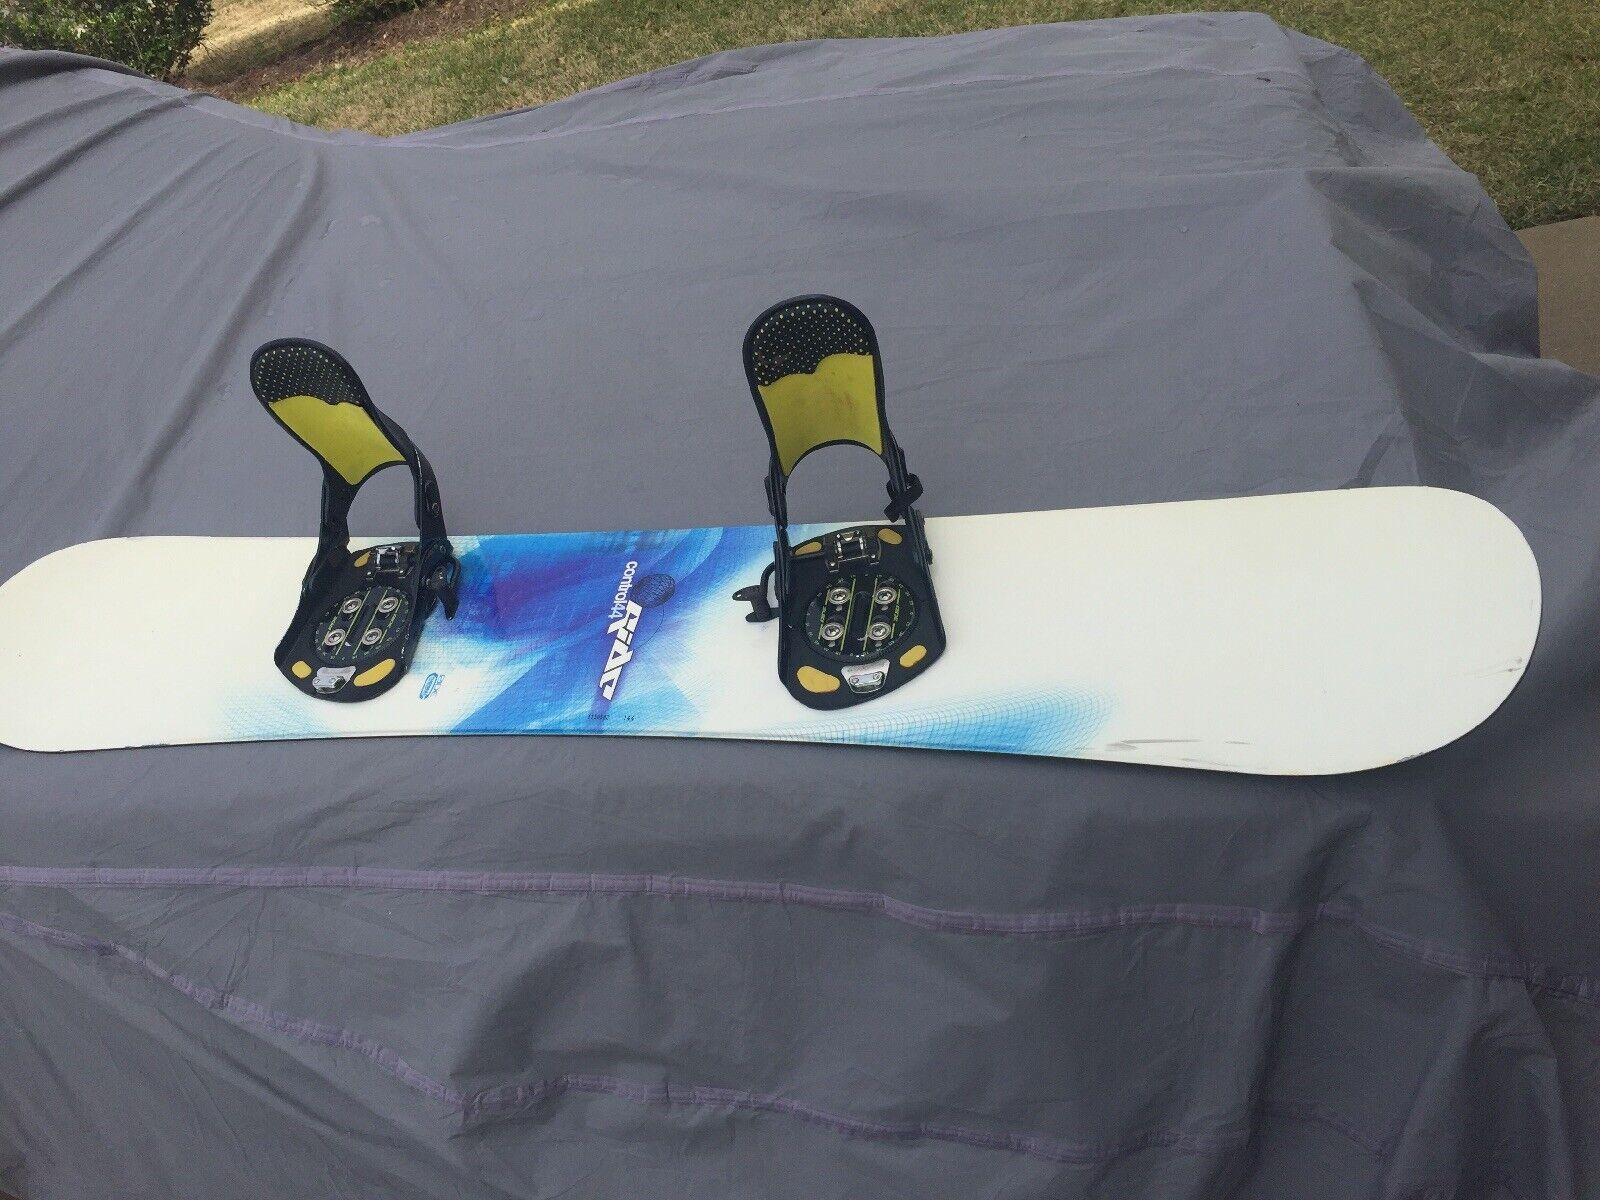 Ride Control 44 Board With Ride E Series Bindings